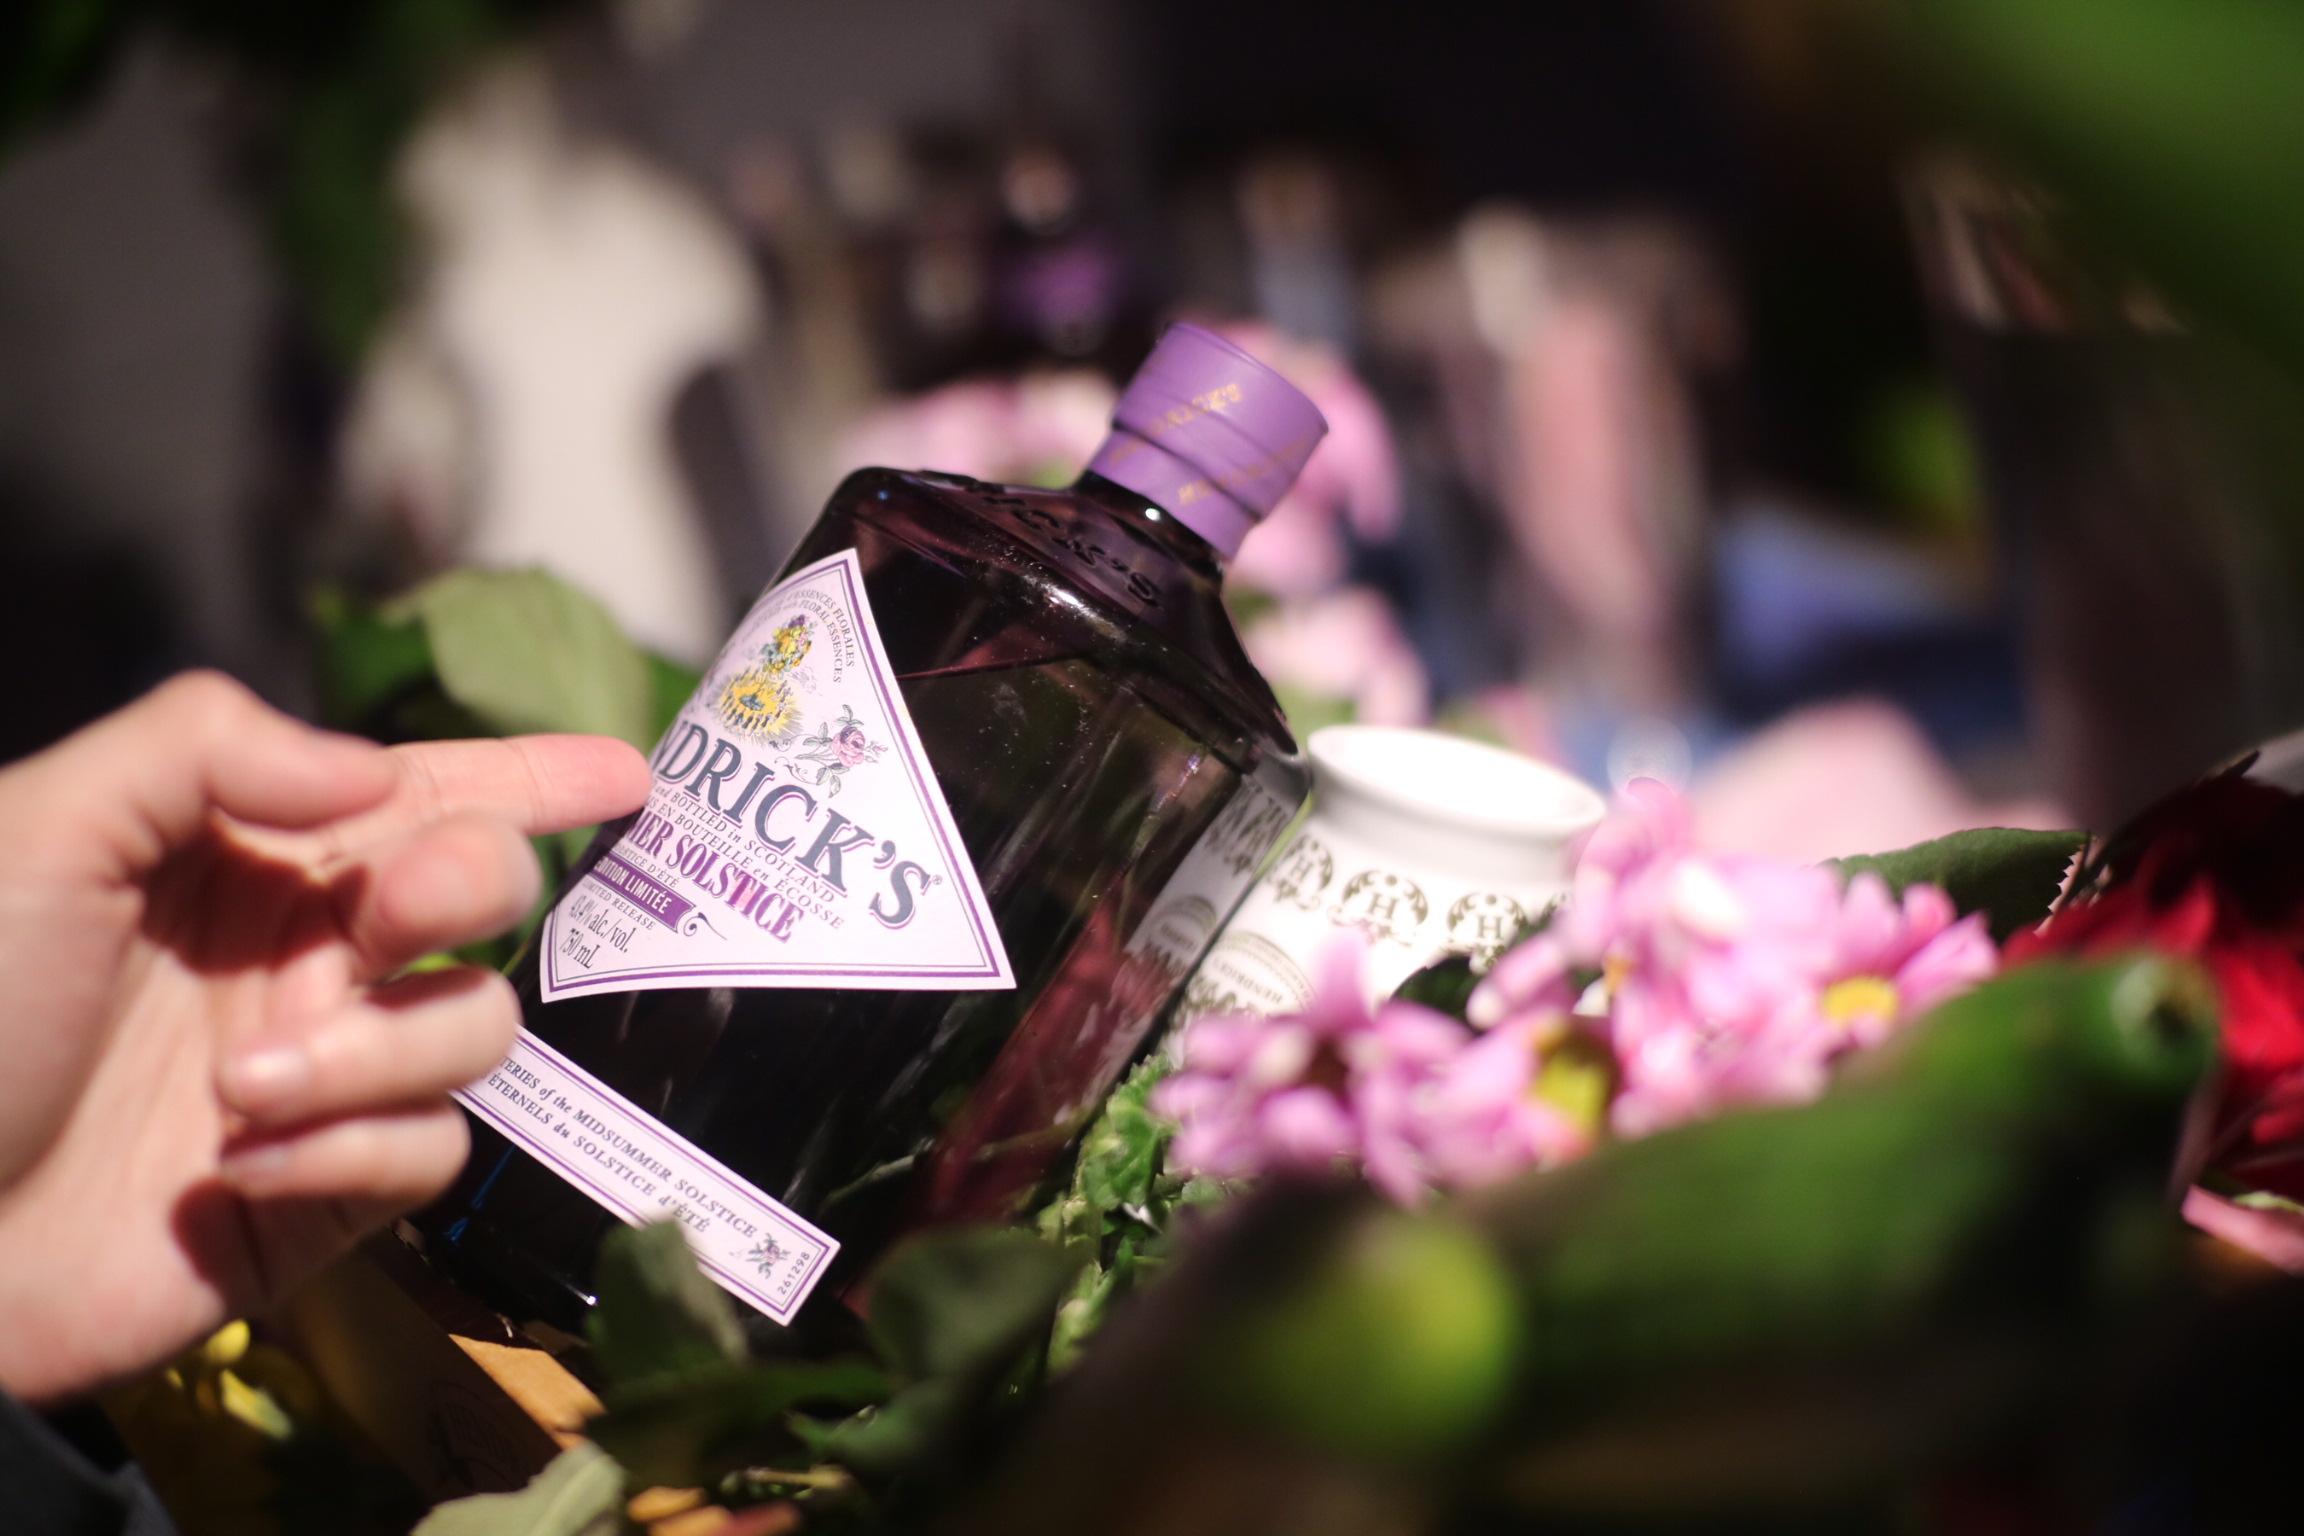 Hendrick's Mid-Summer Solstice Gin